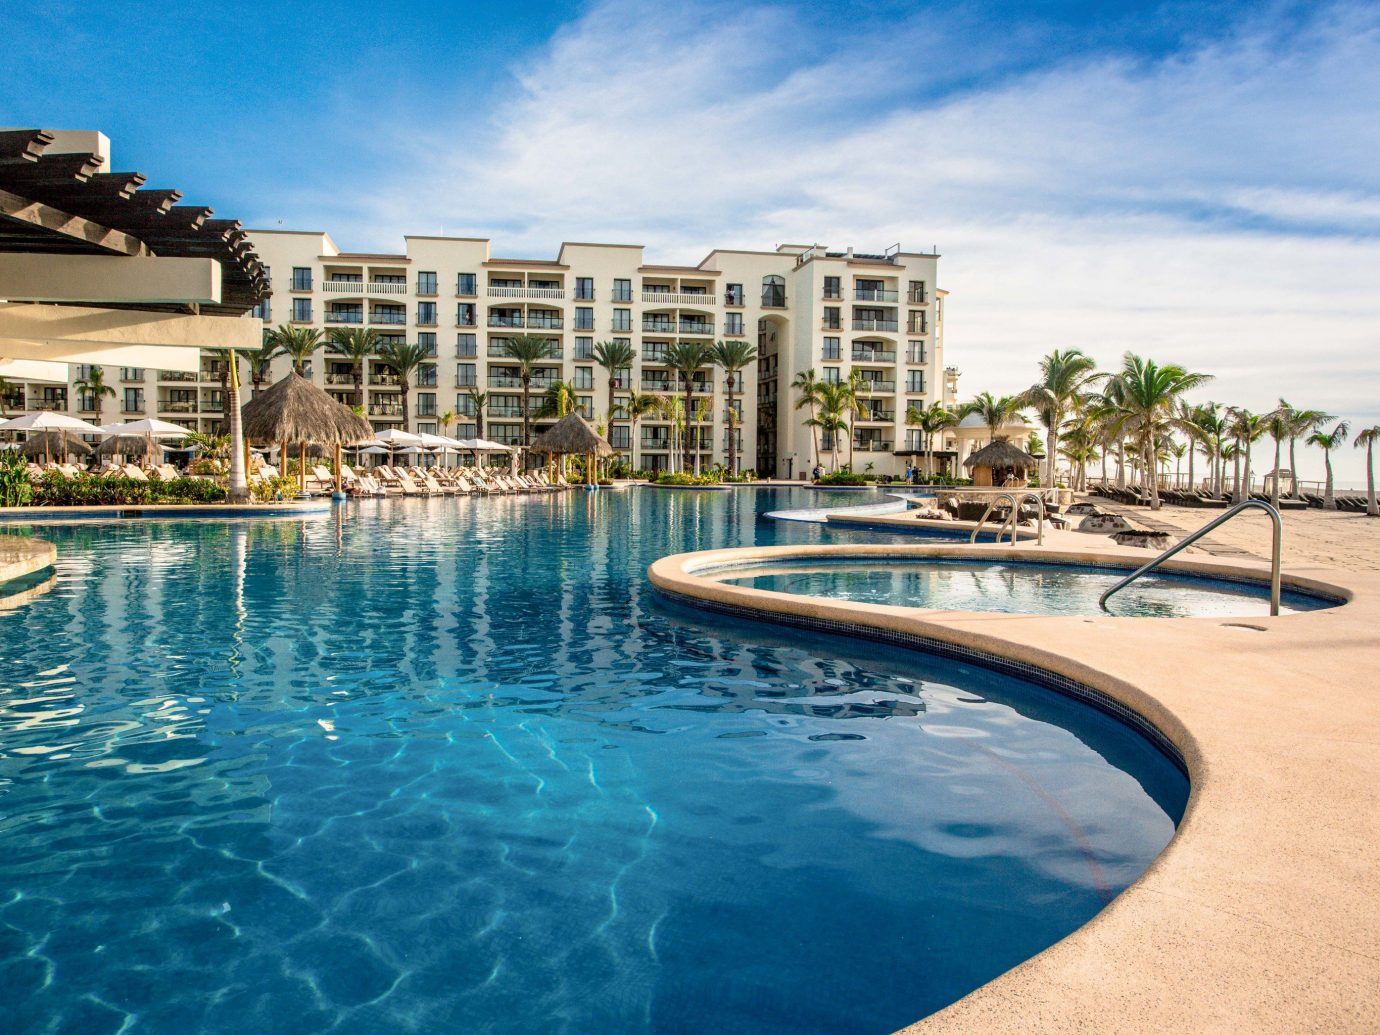 Hotels sky outdoor water swimming pool property leisure Resort condominium estate vacation Pool marina real estate dock bay Sea swimming shore day